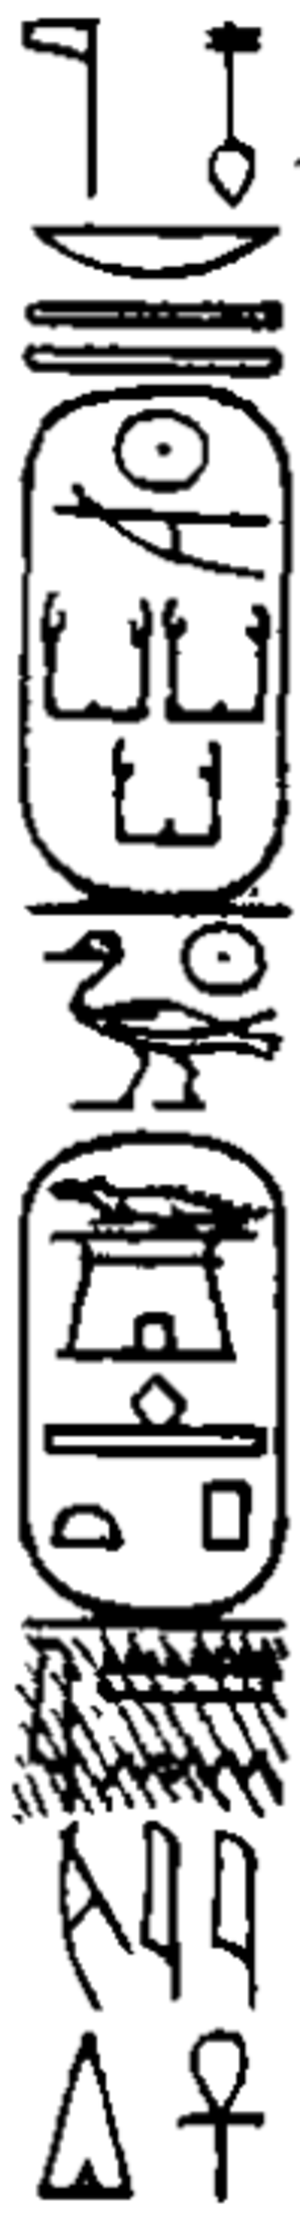 Merkawre Sobekhotep - Inscription from a pink granite seated statue of Merkawre Sobekhotep discovered in Karnak.